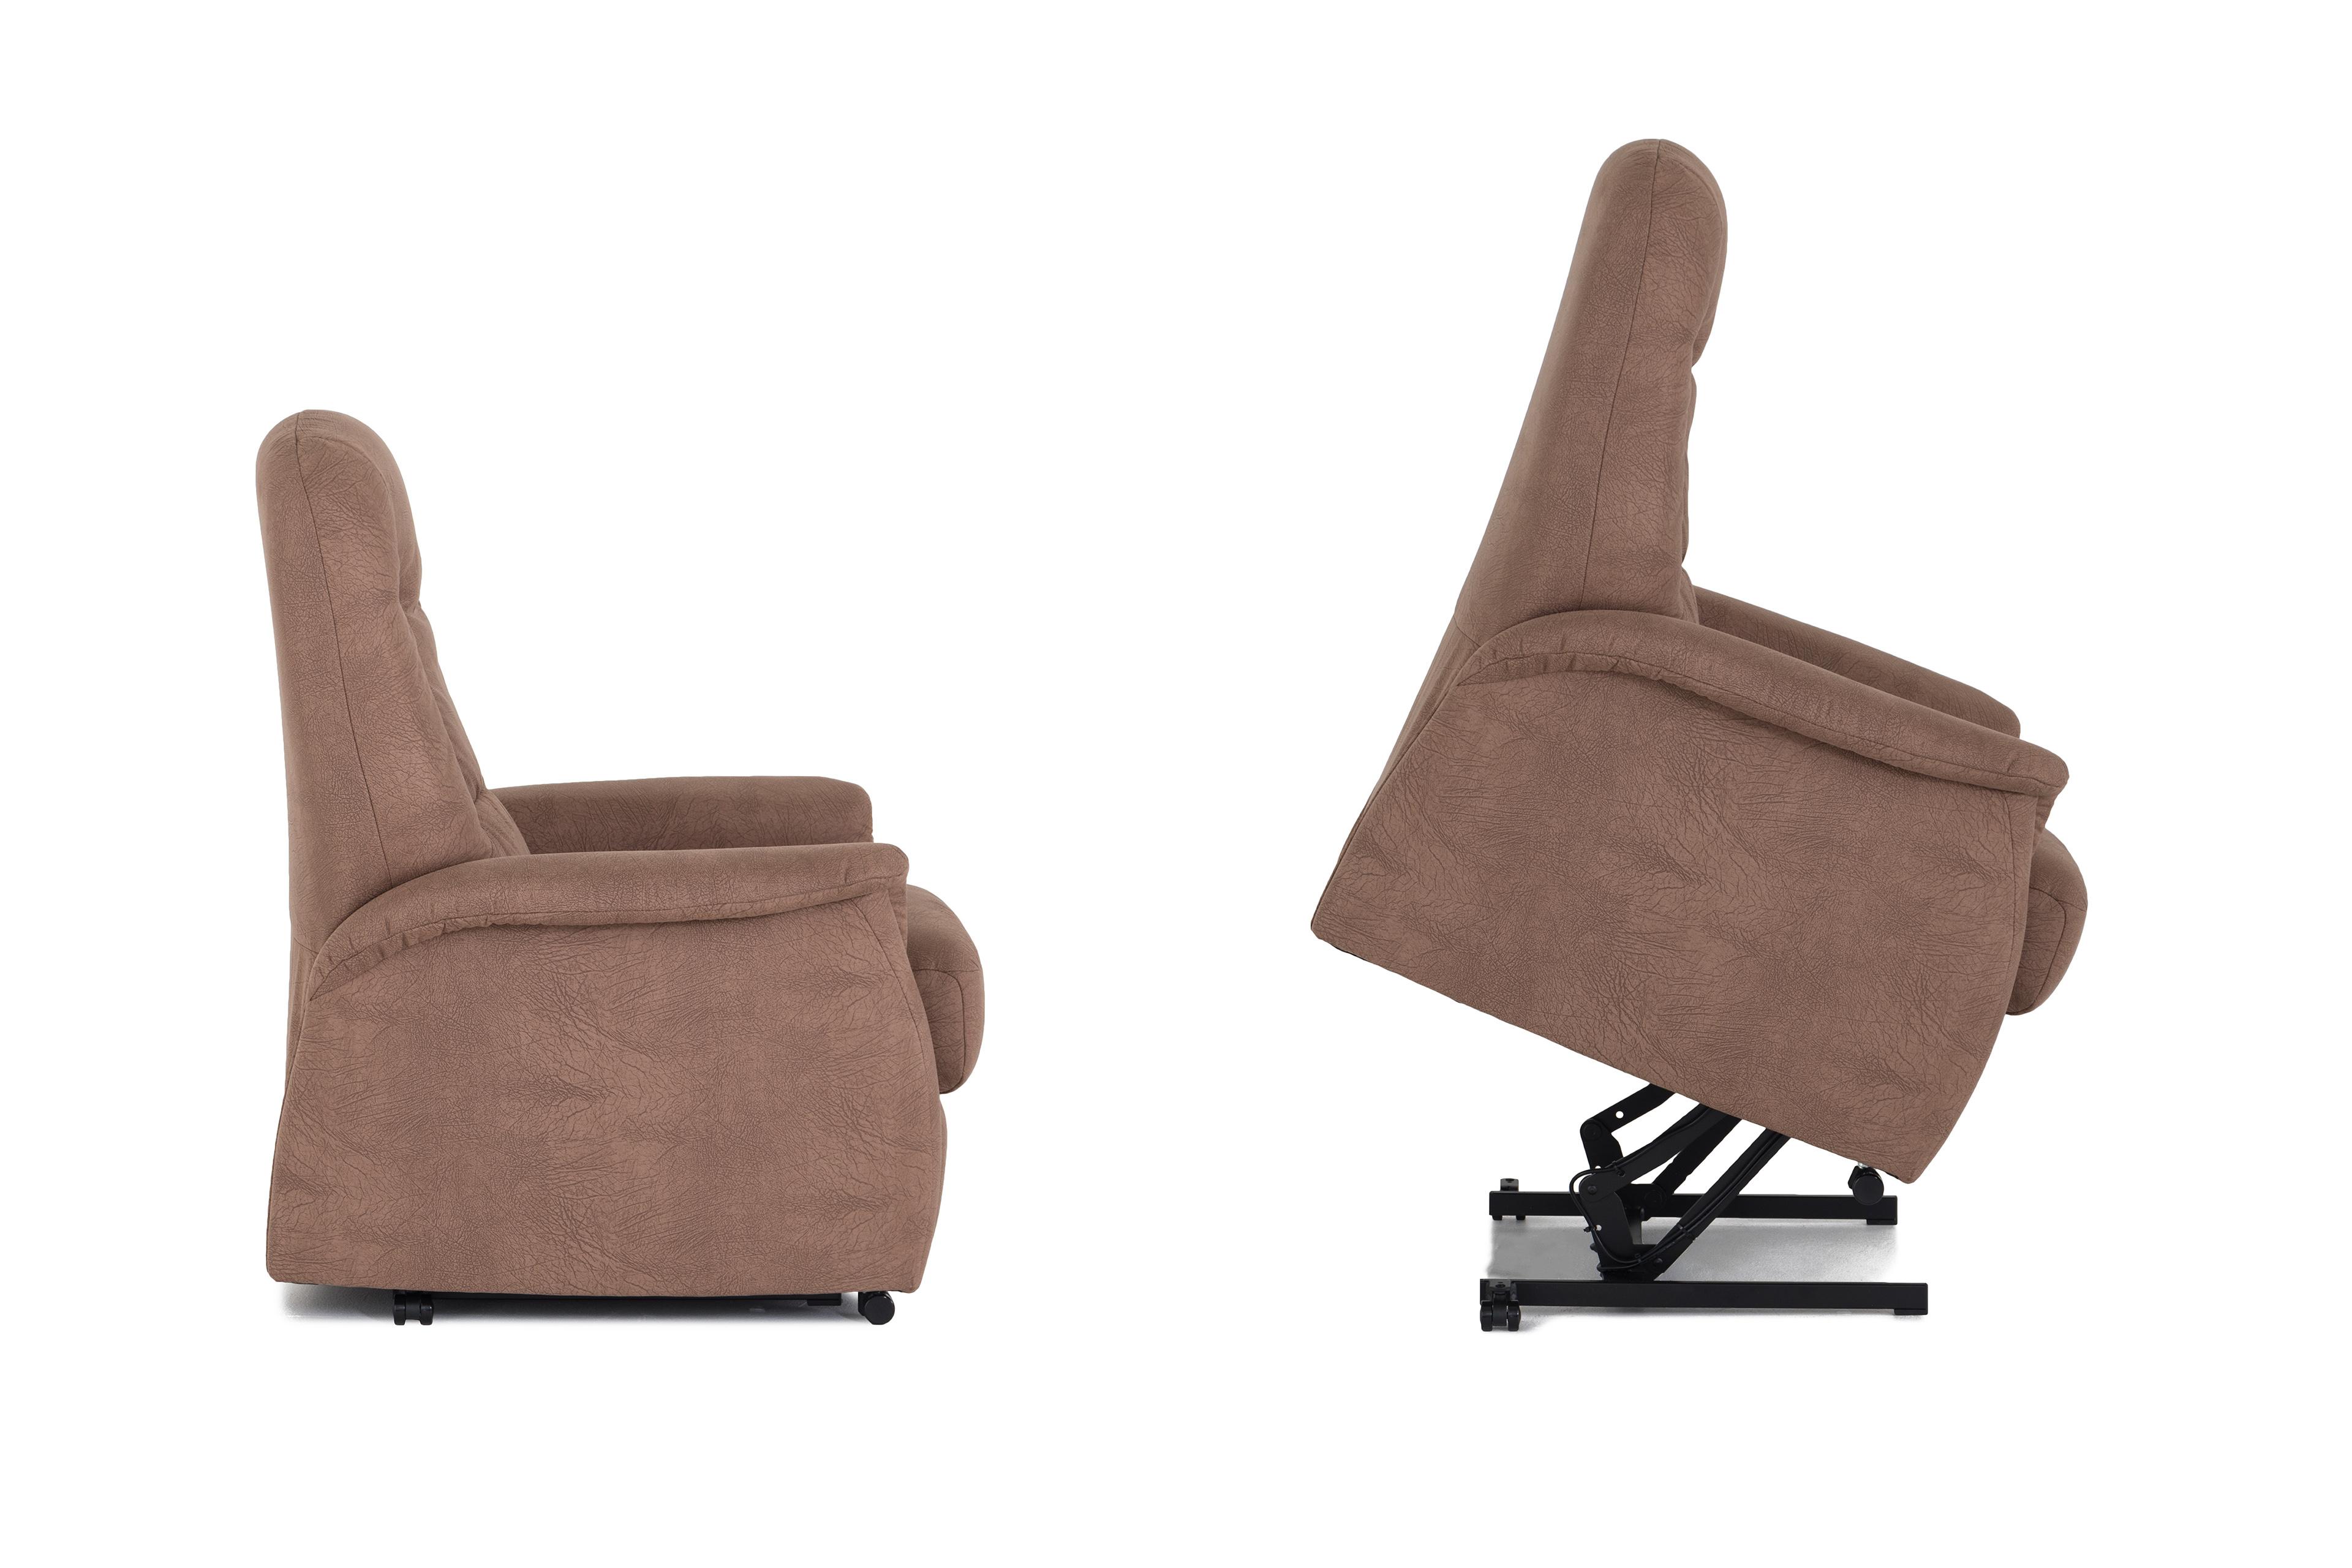 hukla rv02 relaxsessel in braun m bel letz ihr online shop. Black Bedroom Furniture Sets. Home Design Ideas